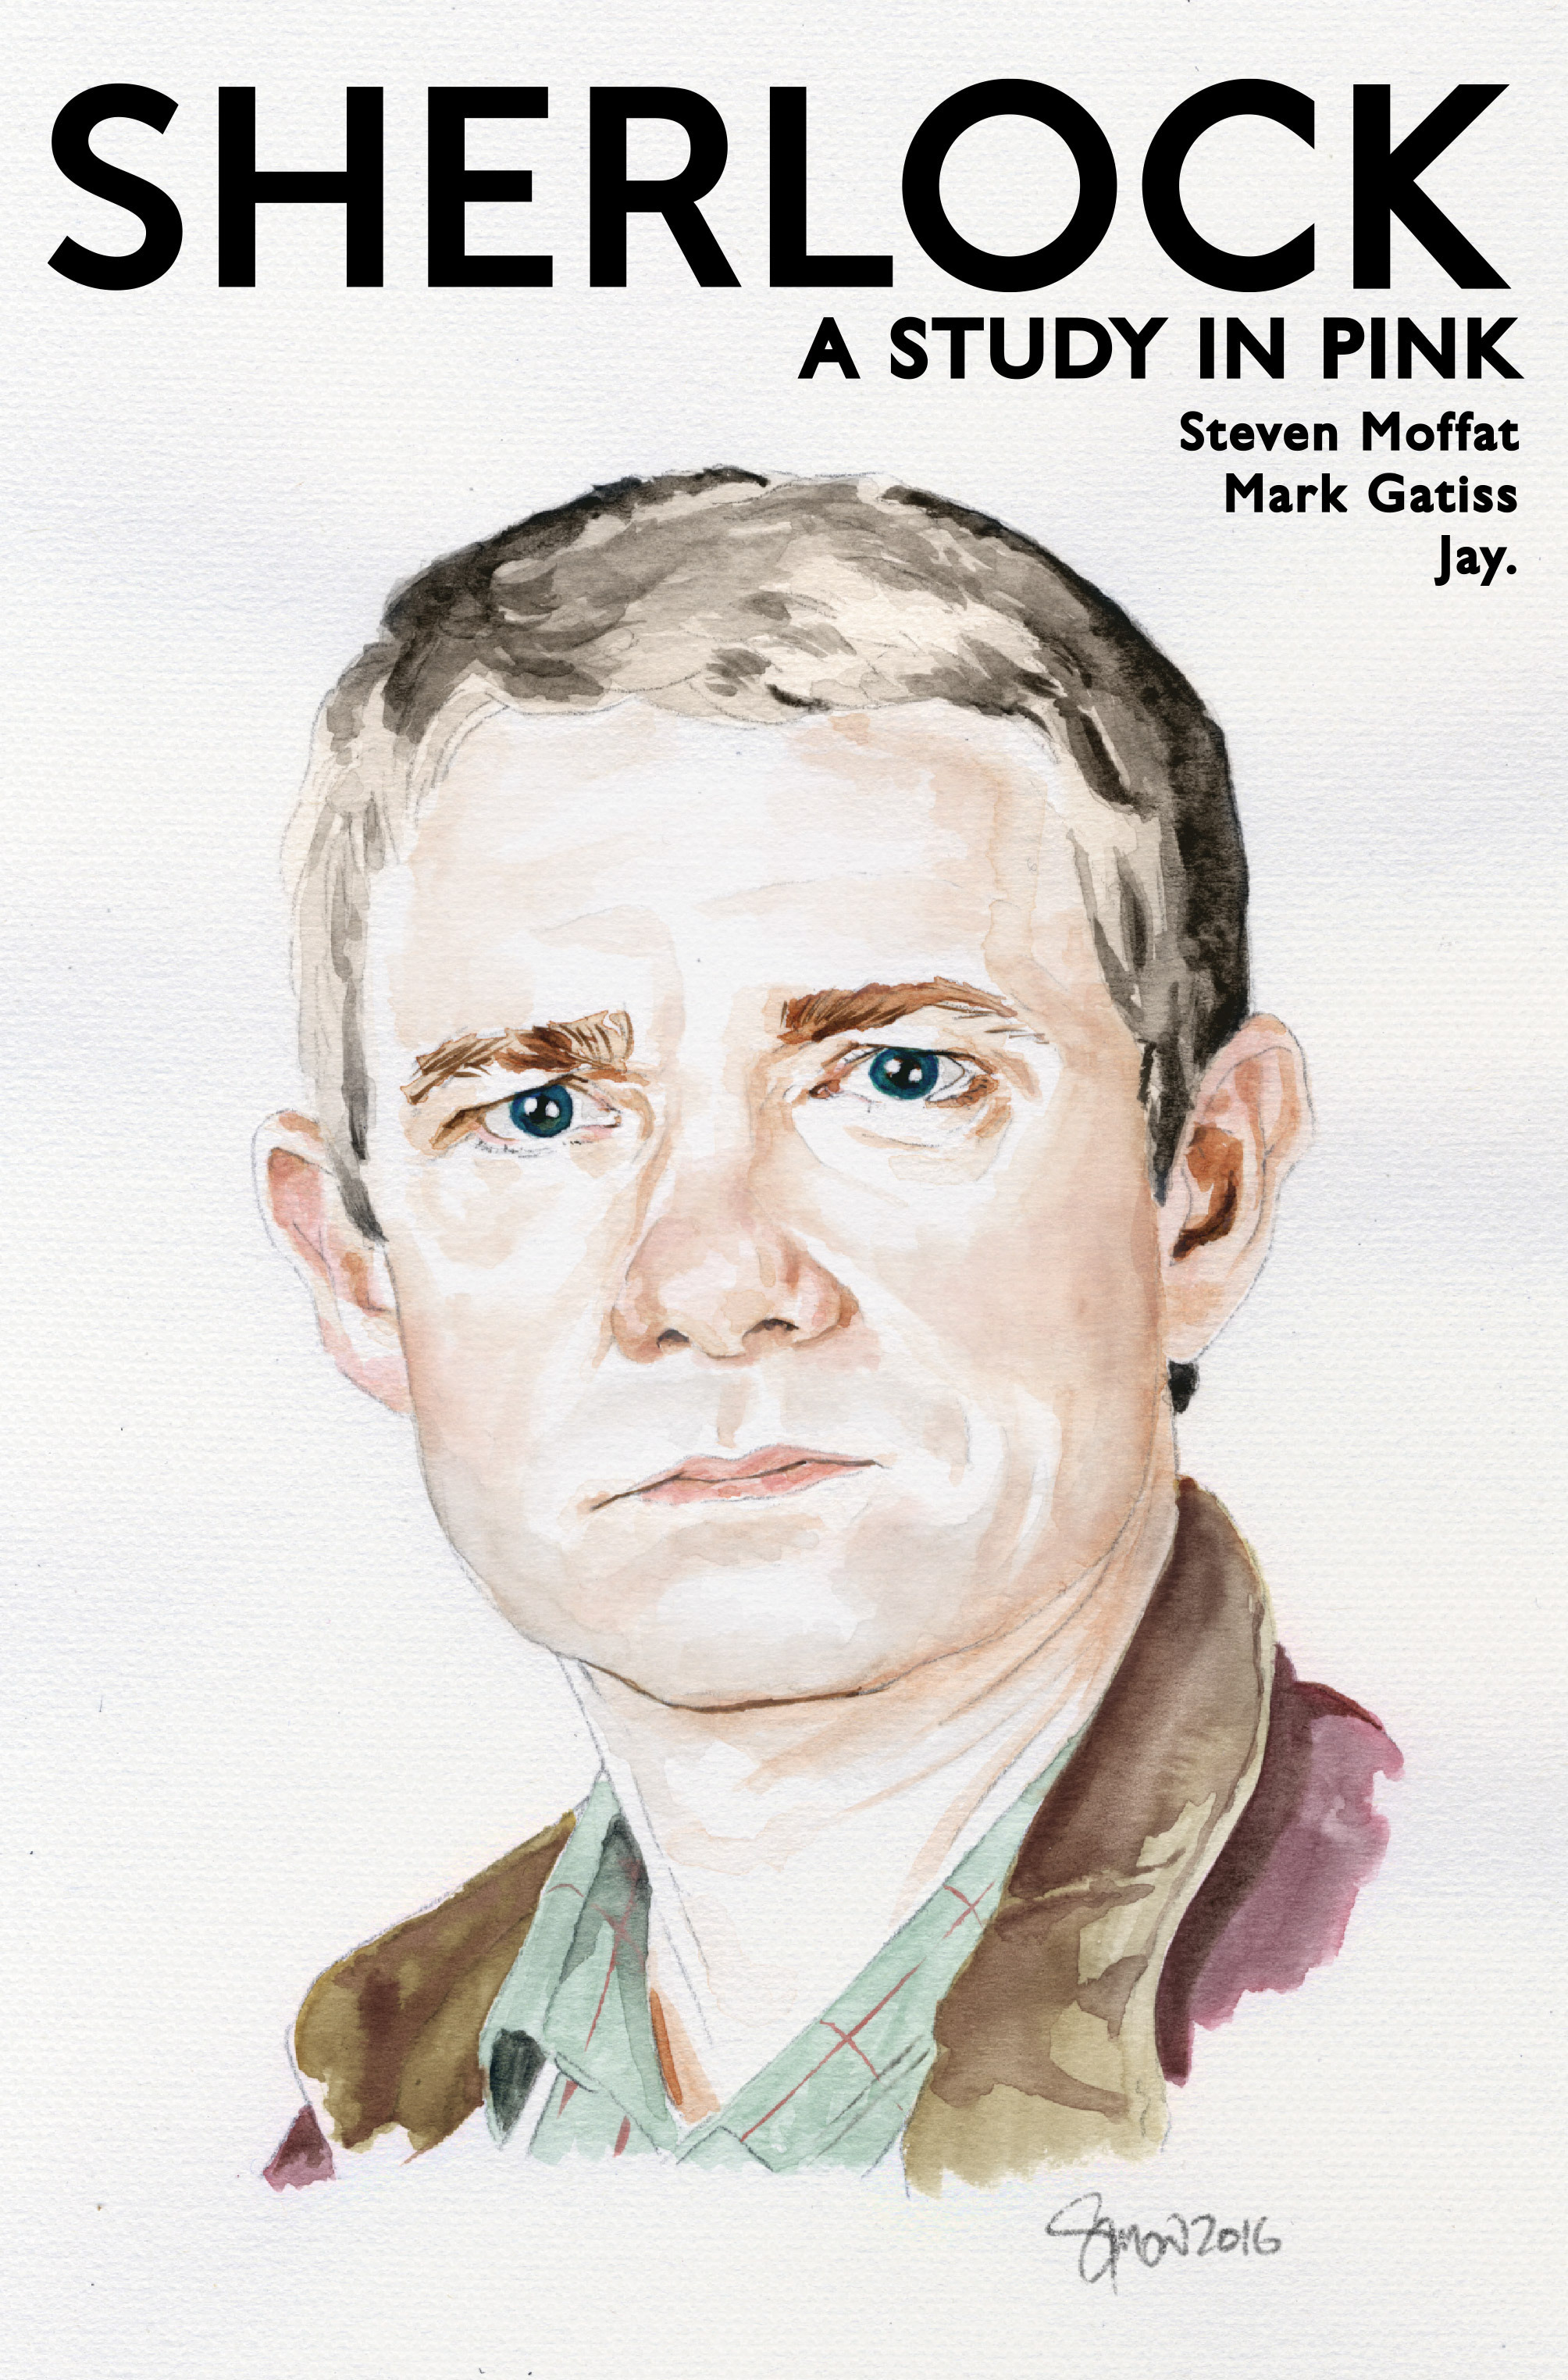 Read online Sherlock: A Study In Pink comic -  Issue #4 - 3